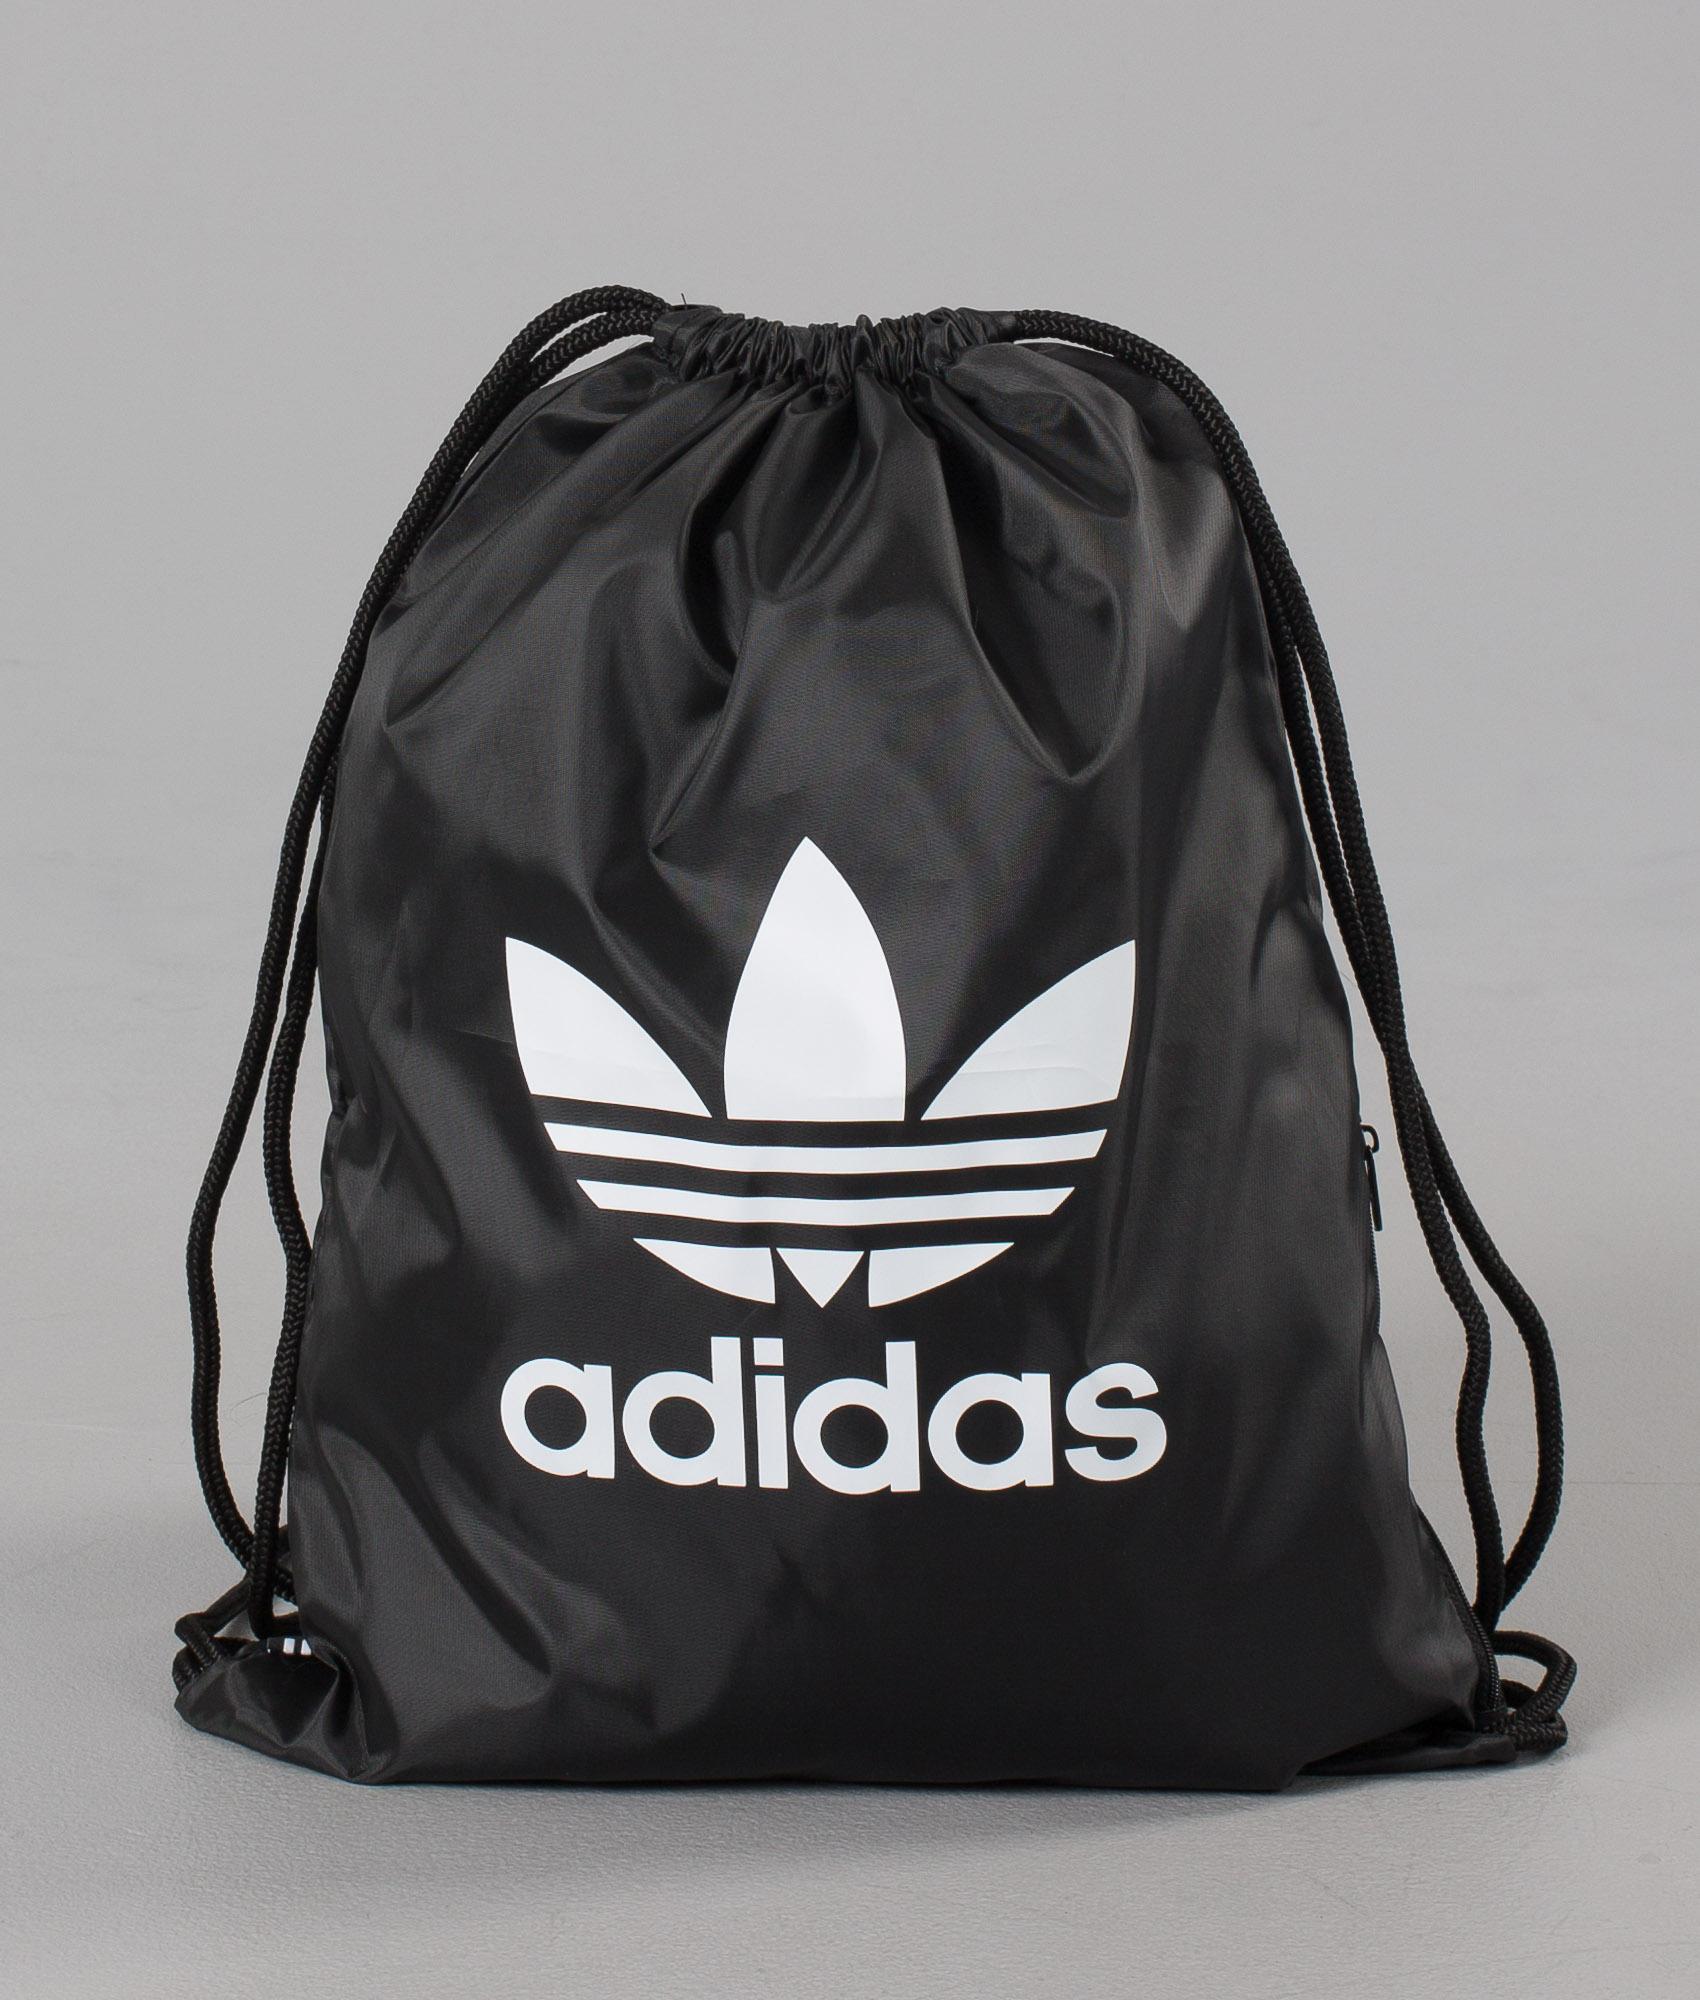 huge selection of 26640 4b466 Adidas Originals Gymsack Trefoil Bag Black - Ridestore.com